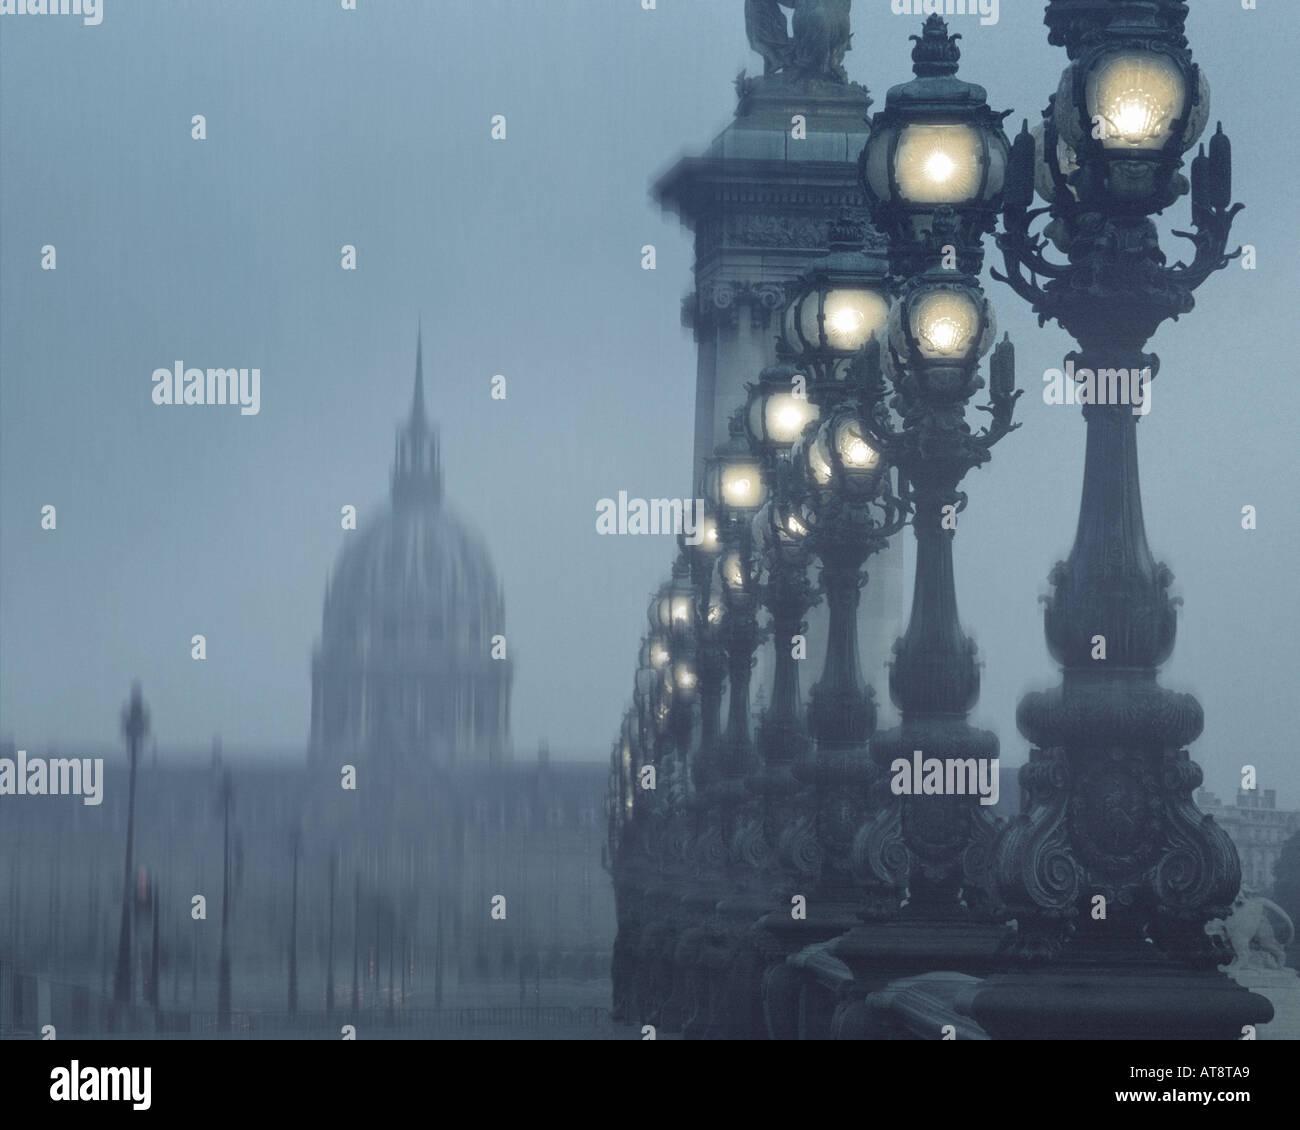 FR - PARIS: Pont Alexandre III Immagini Stock